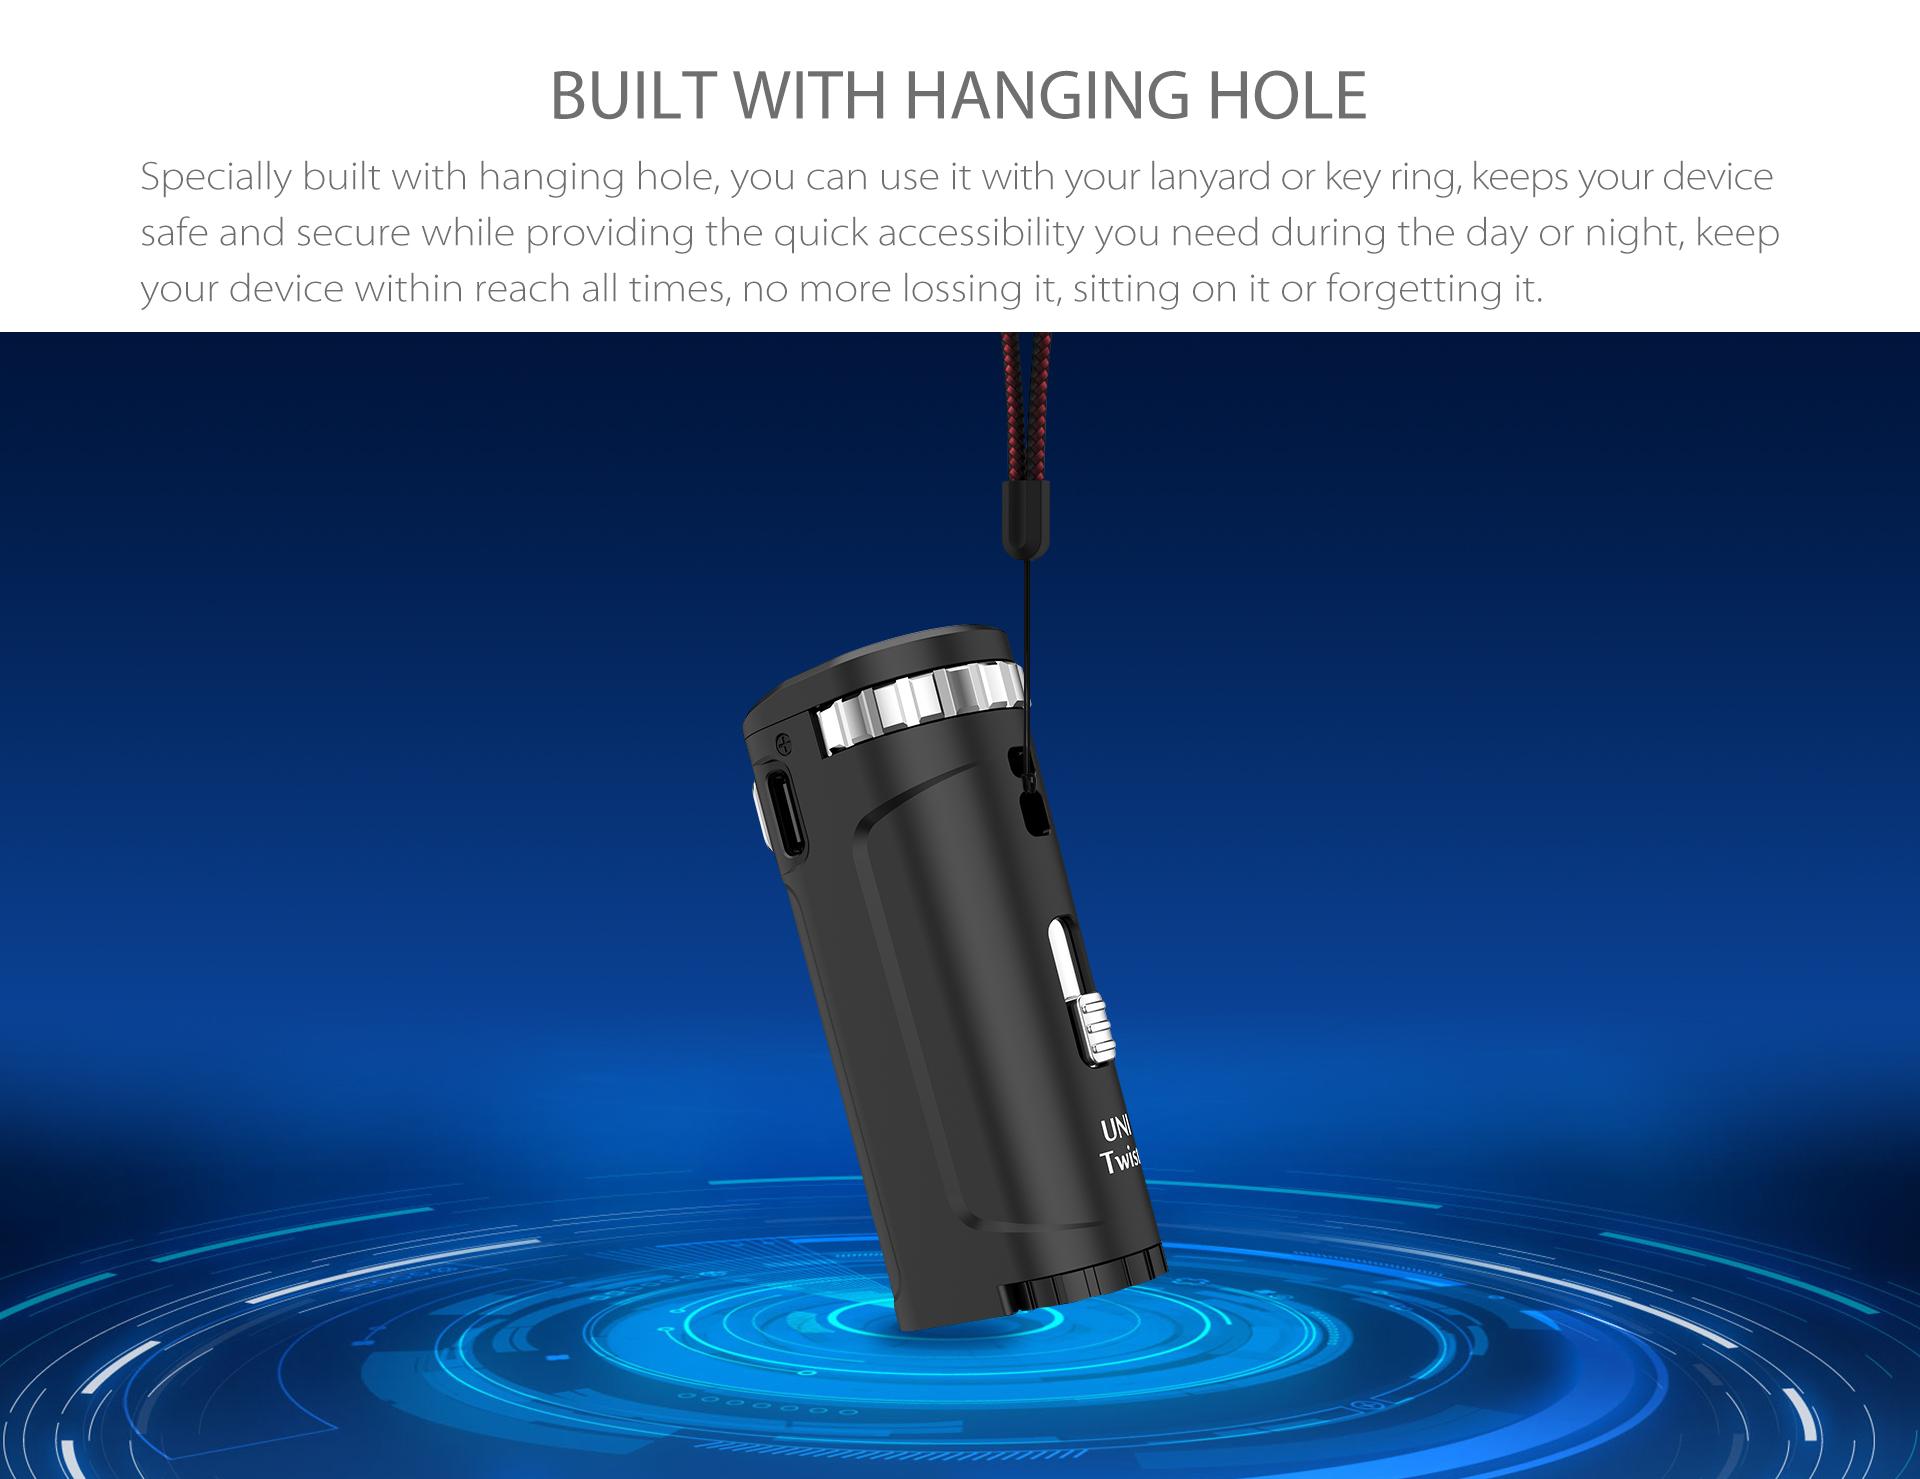 Yocan UNI Twist Universal Portable Mod built with hanging hole